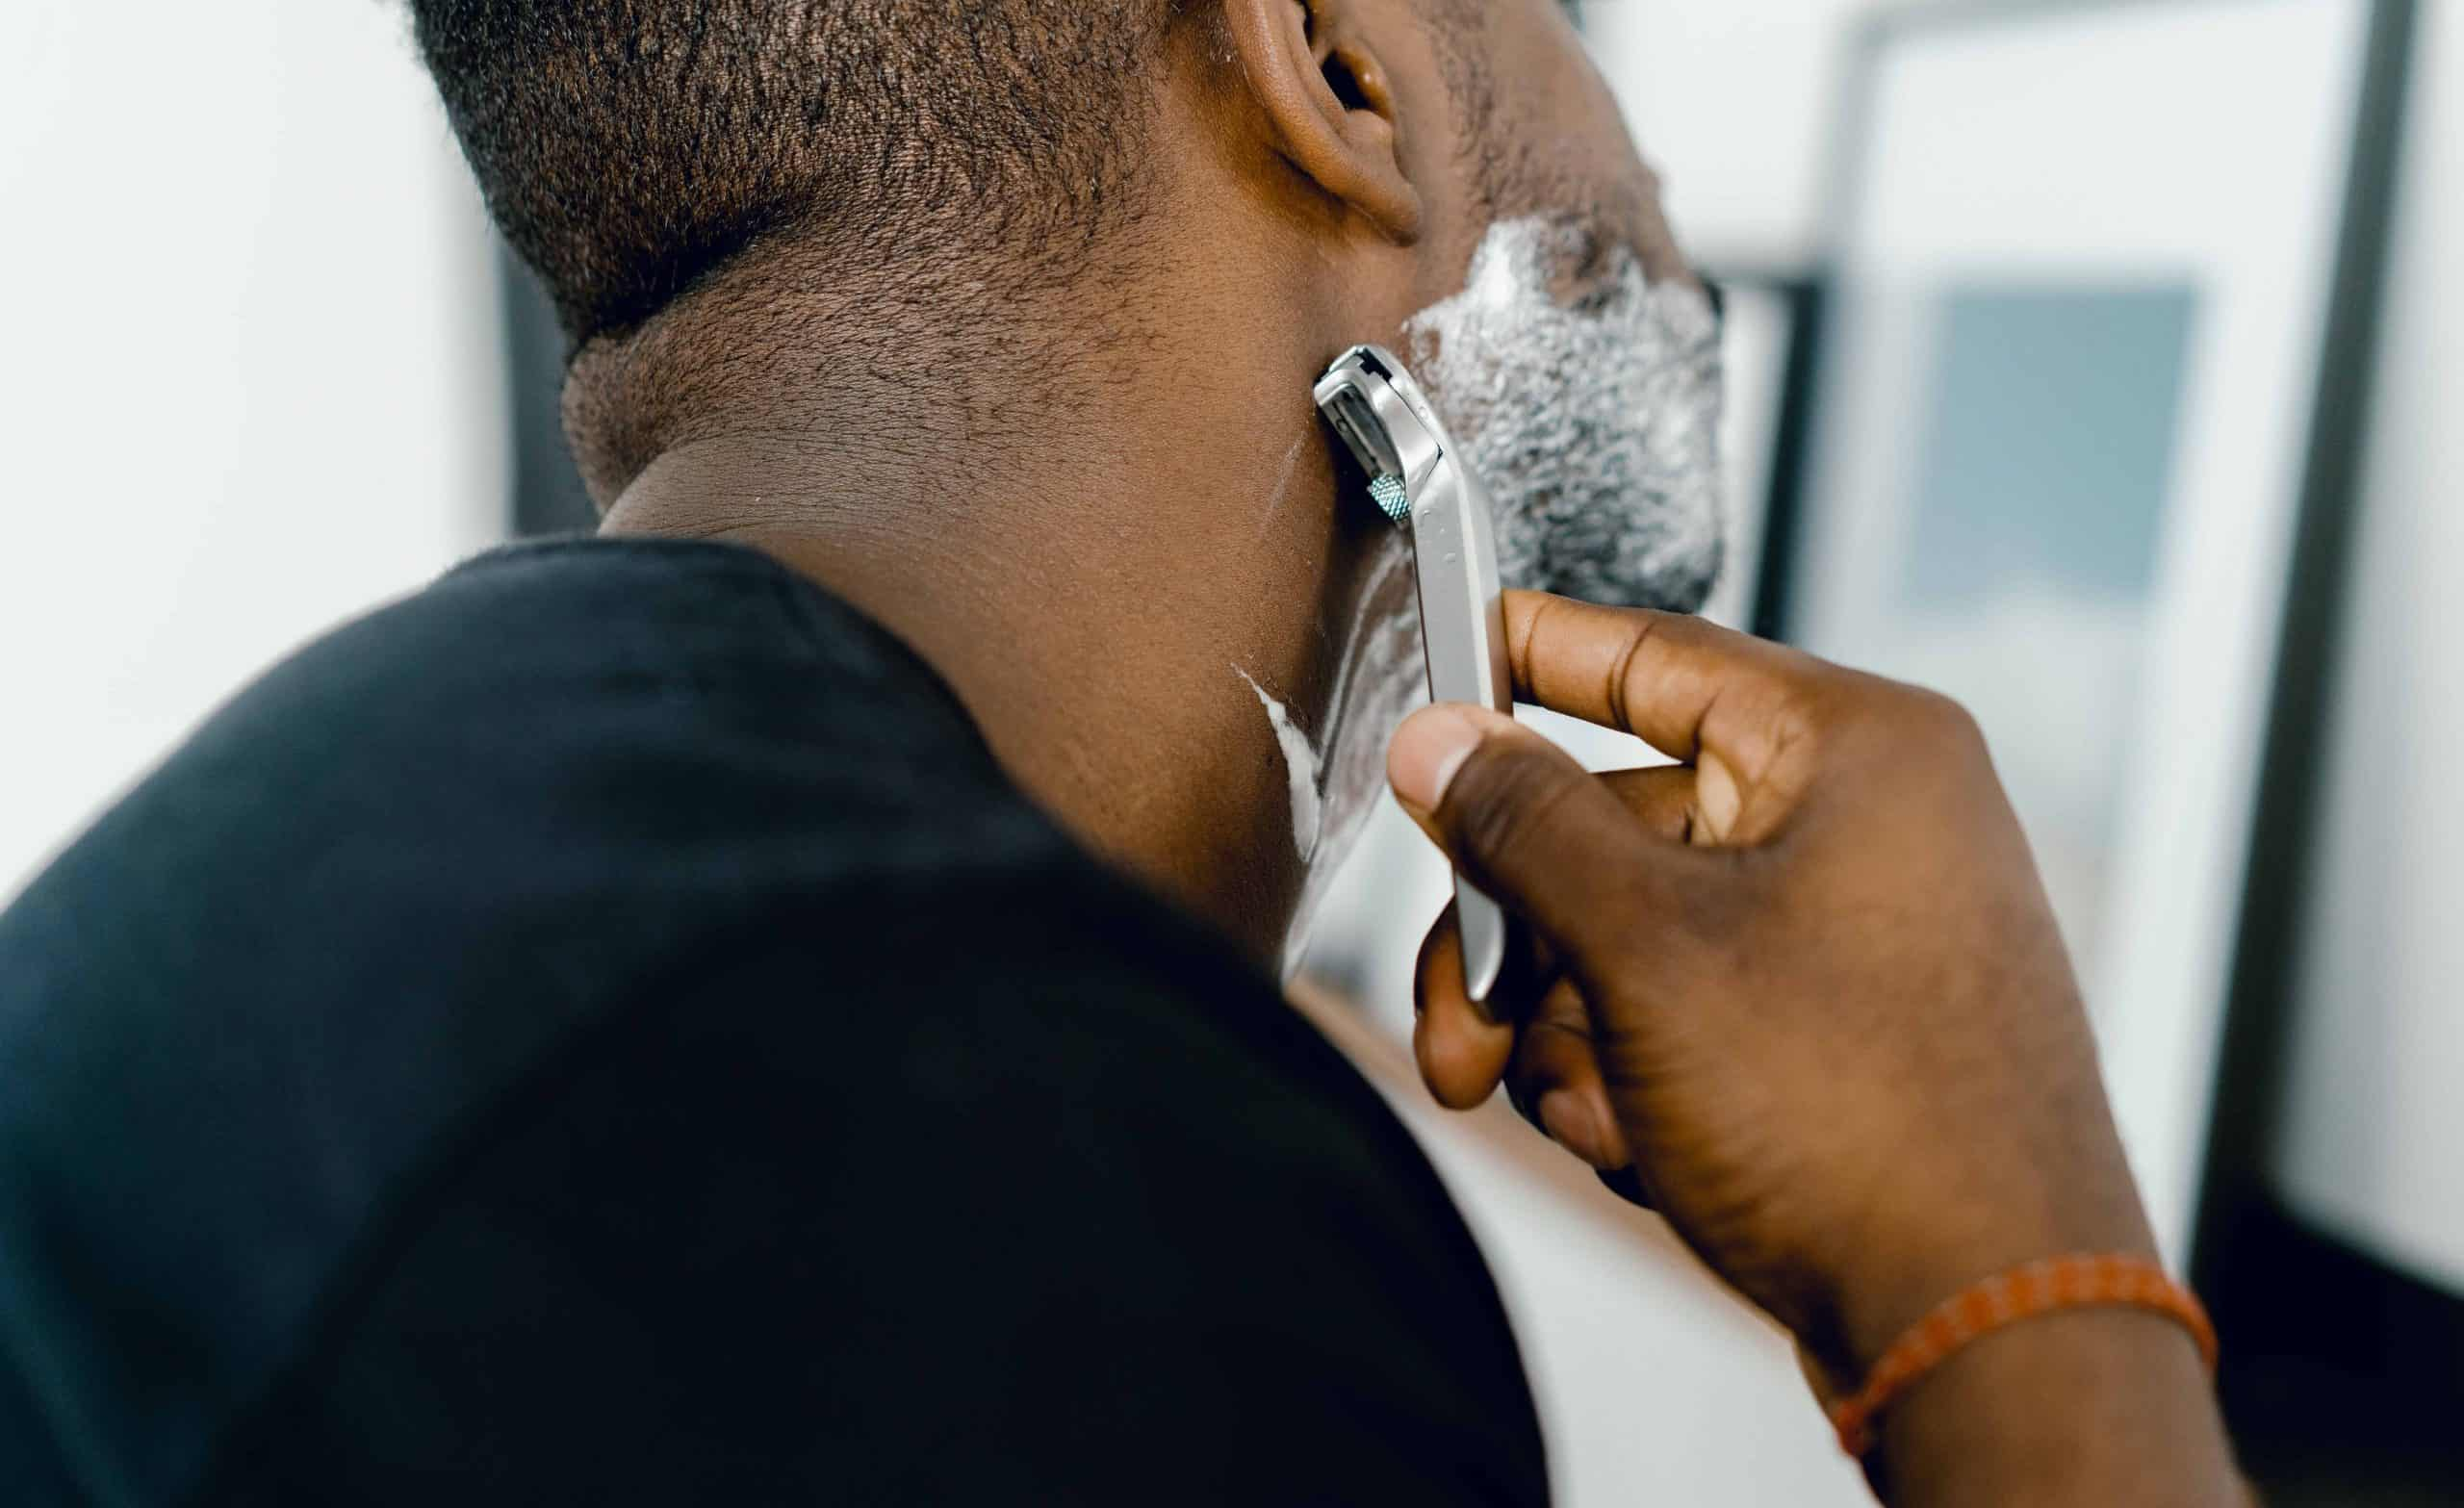 How Do Men Groom Their Face Malegroomingsets Com